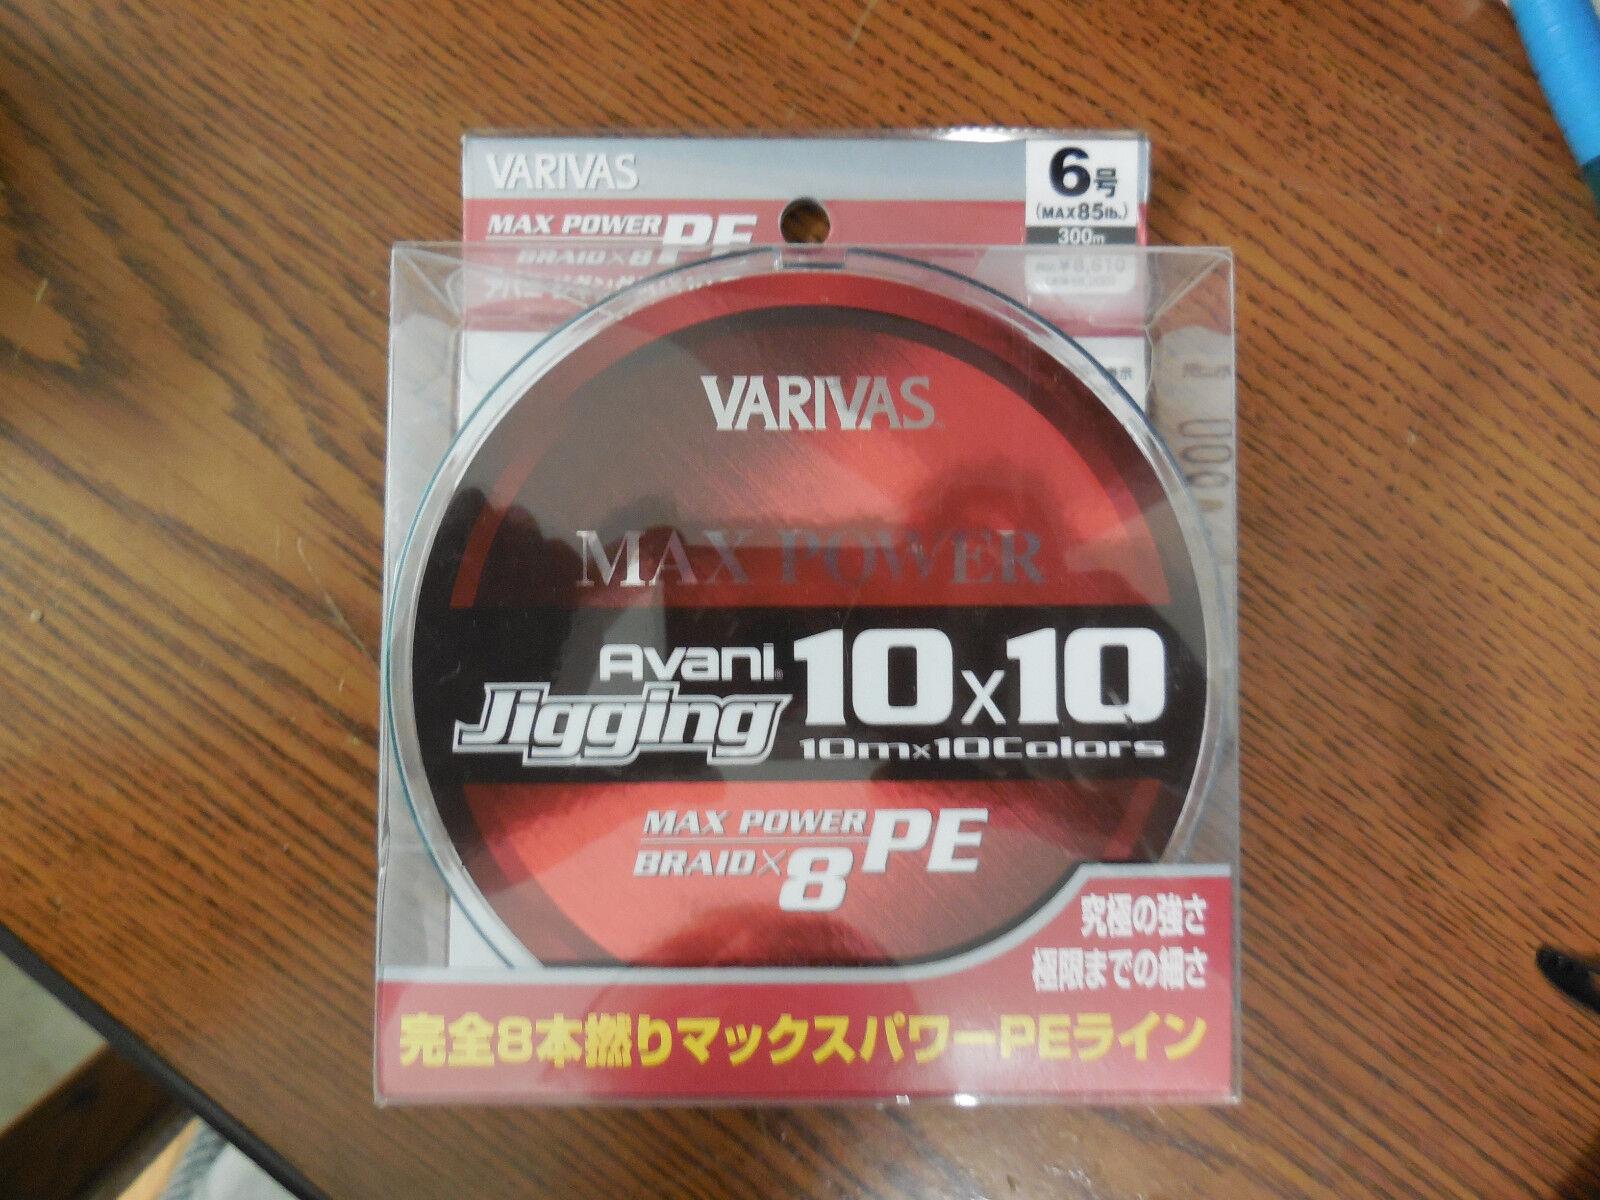 Varivas Avani Jigging 10 6 X 10 Max Power 6 10 38.5kg 300m 8 Biese d5e0eb